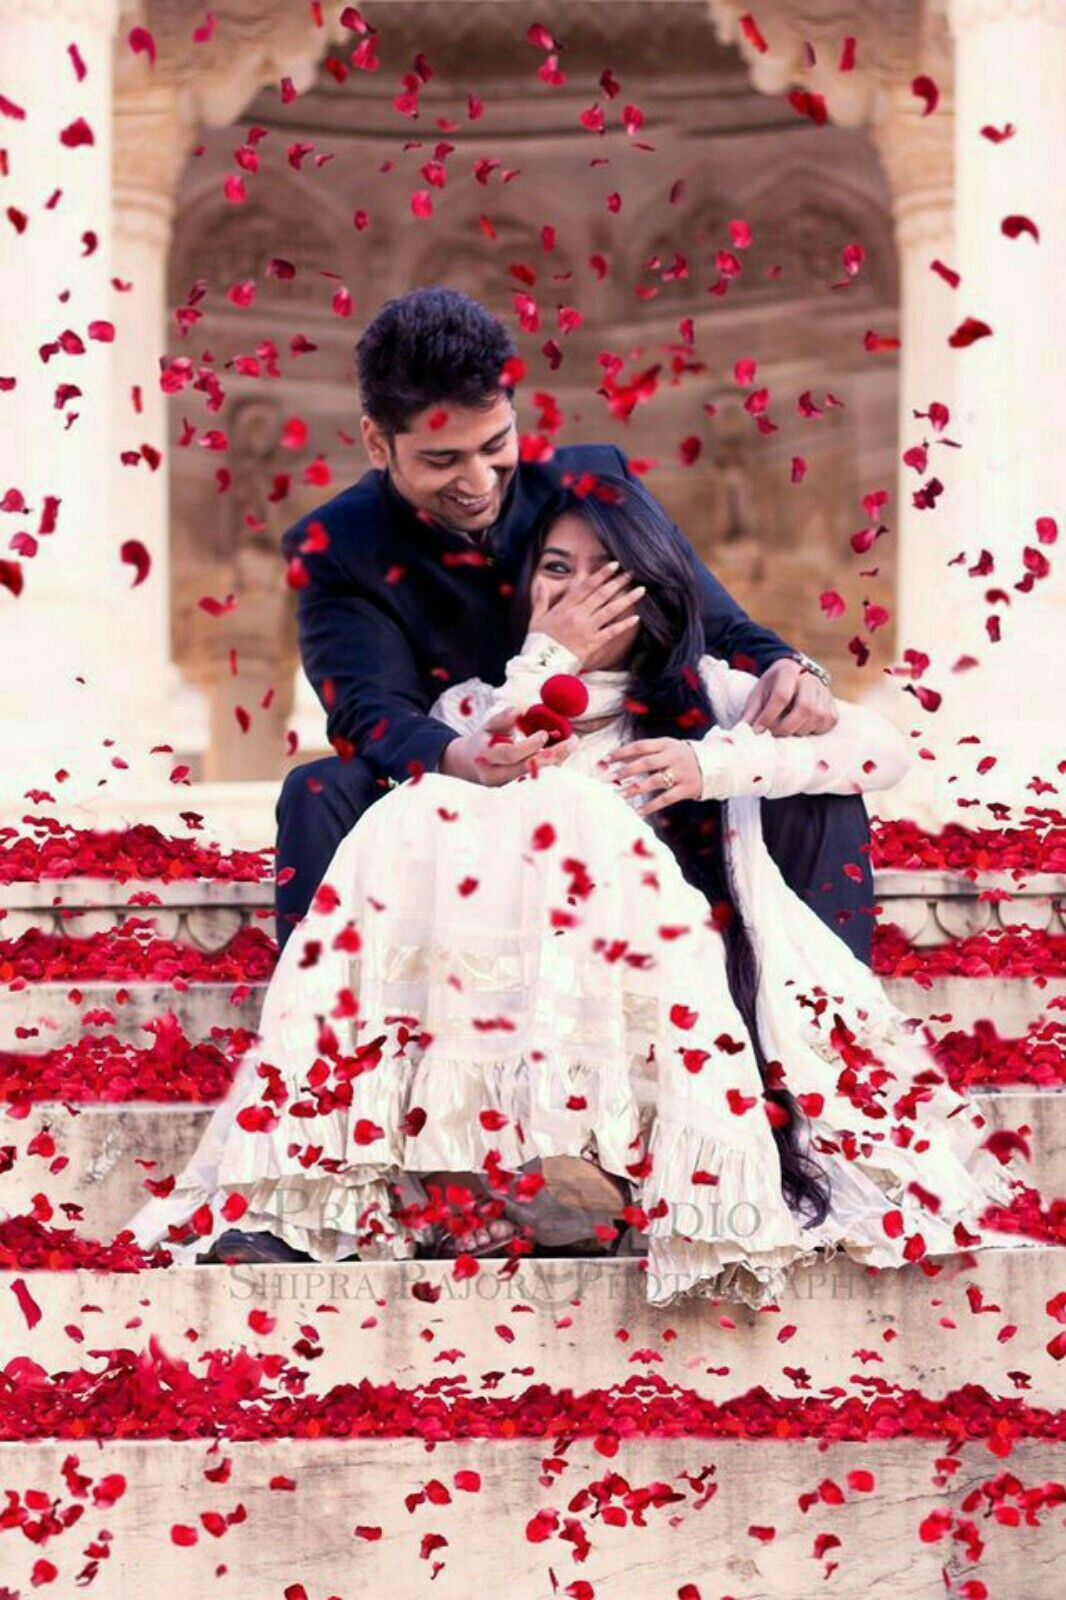 Pin by Farzana on Ek Din  Indian wedding photography, Wedding couple poses photography, Wedding